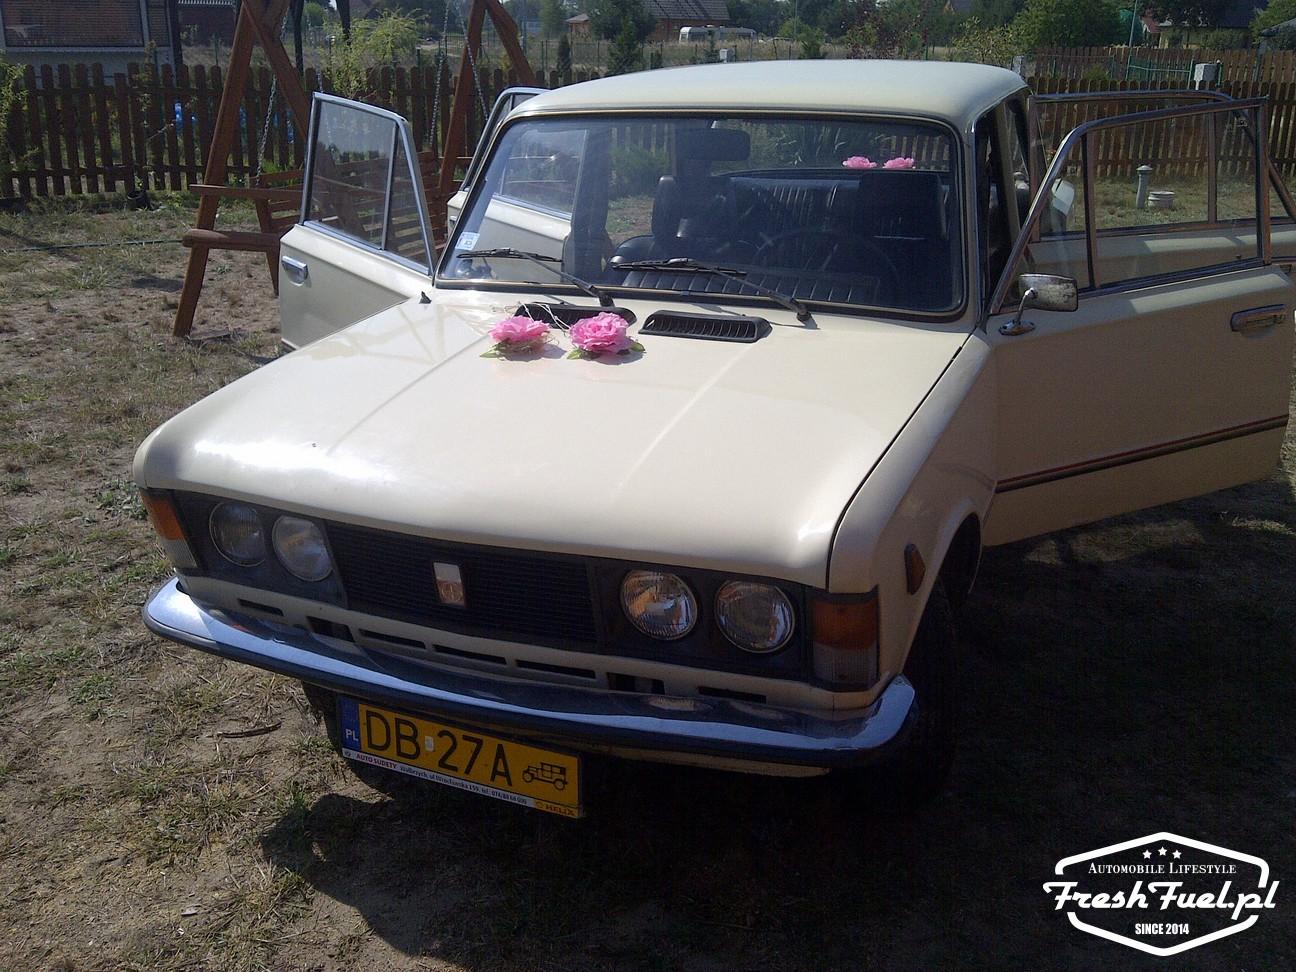 Kolsko-20140906-01663